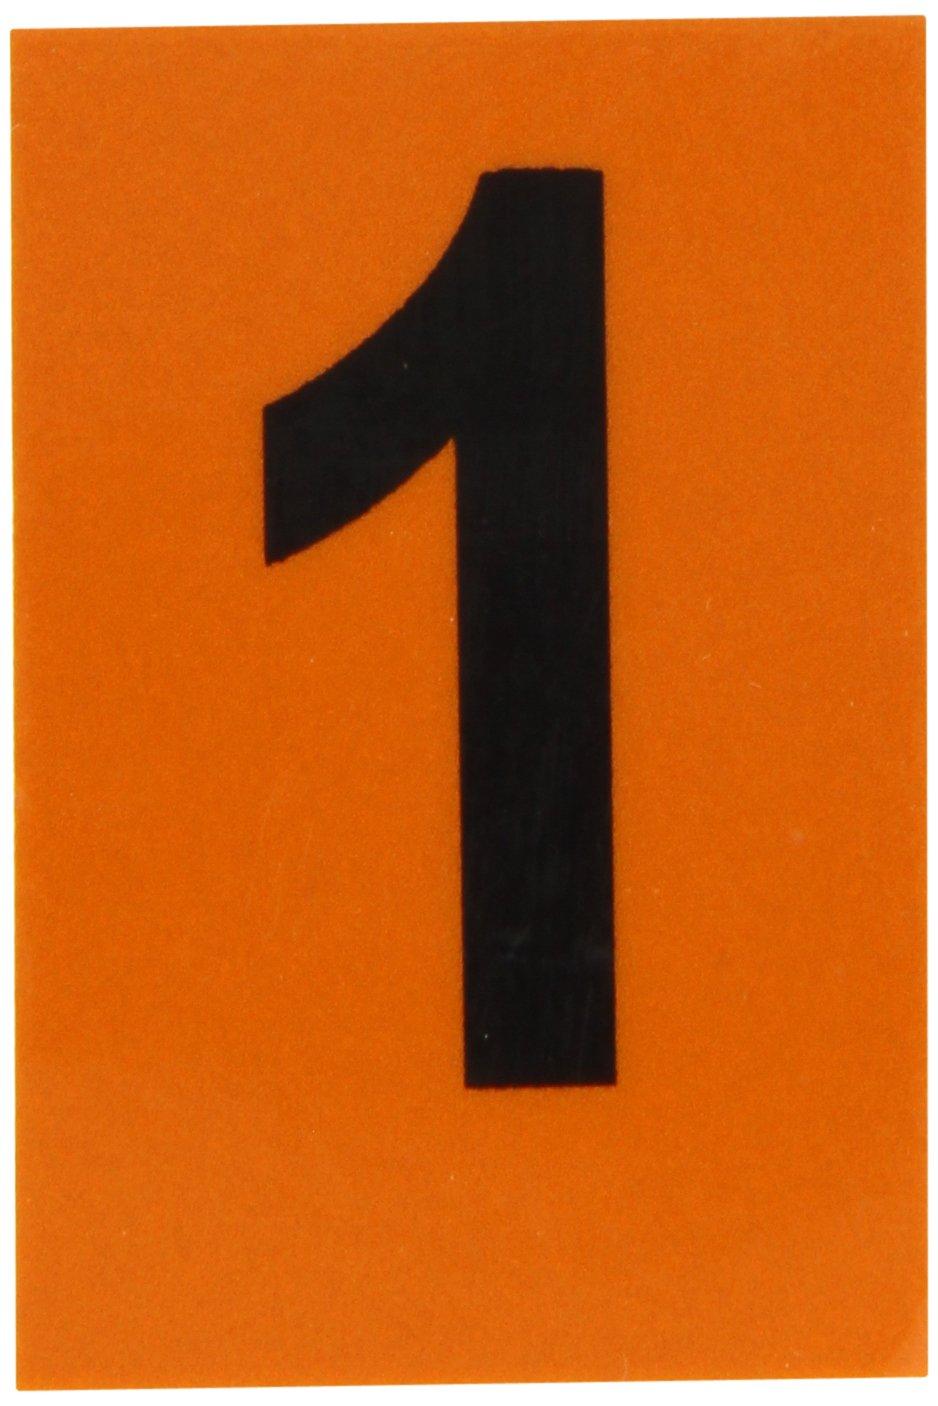 B-997 Sheeting Brady 5910-1 Bradylite 1-1//2 Height 1 Width Black On Orange Color Reflective Number Legend 1 Pack Of 25